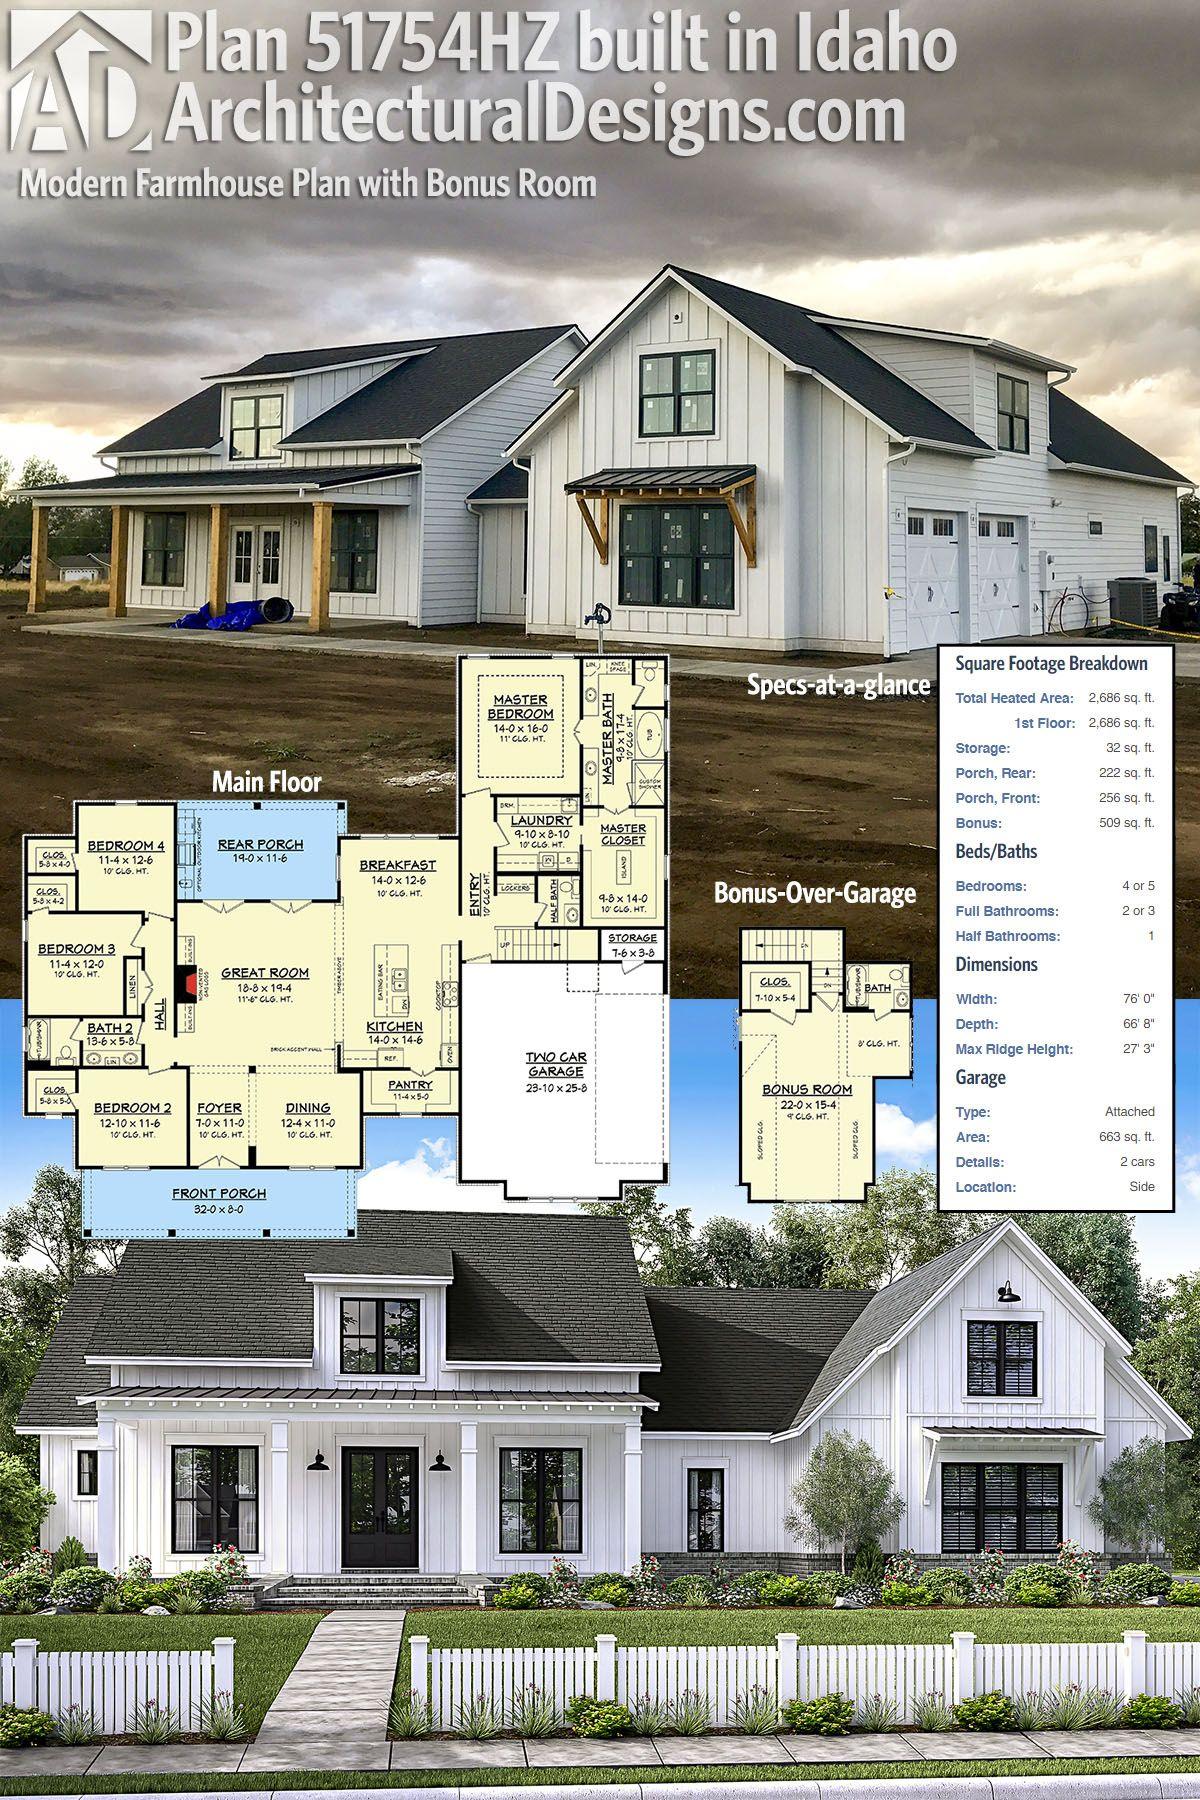 Architectural Designs Modern Farmhouse Plan 51754HZ coming